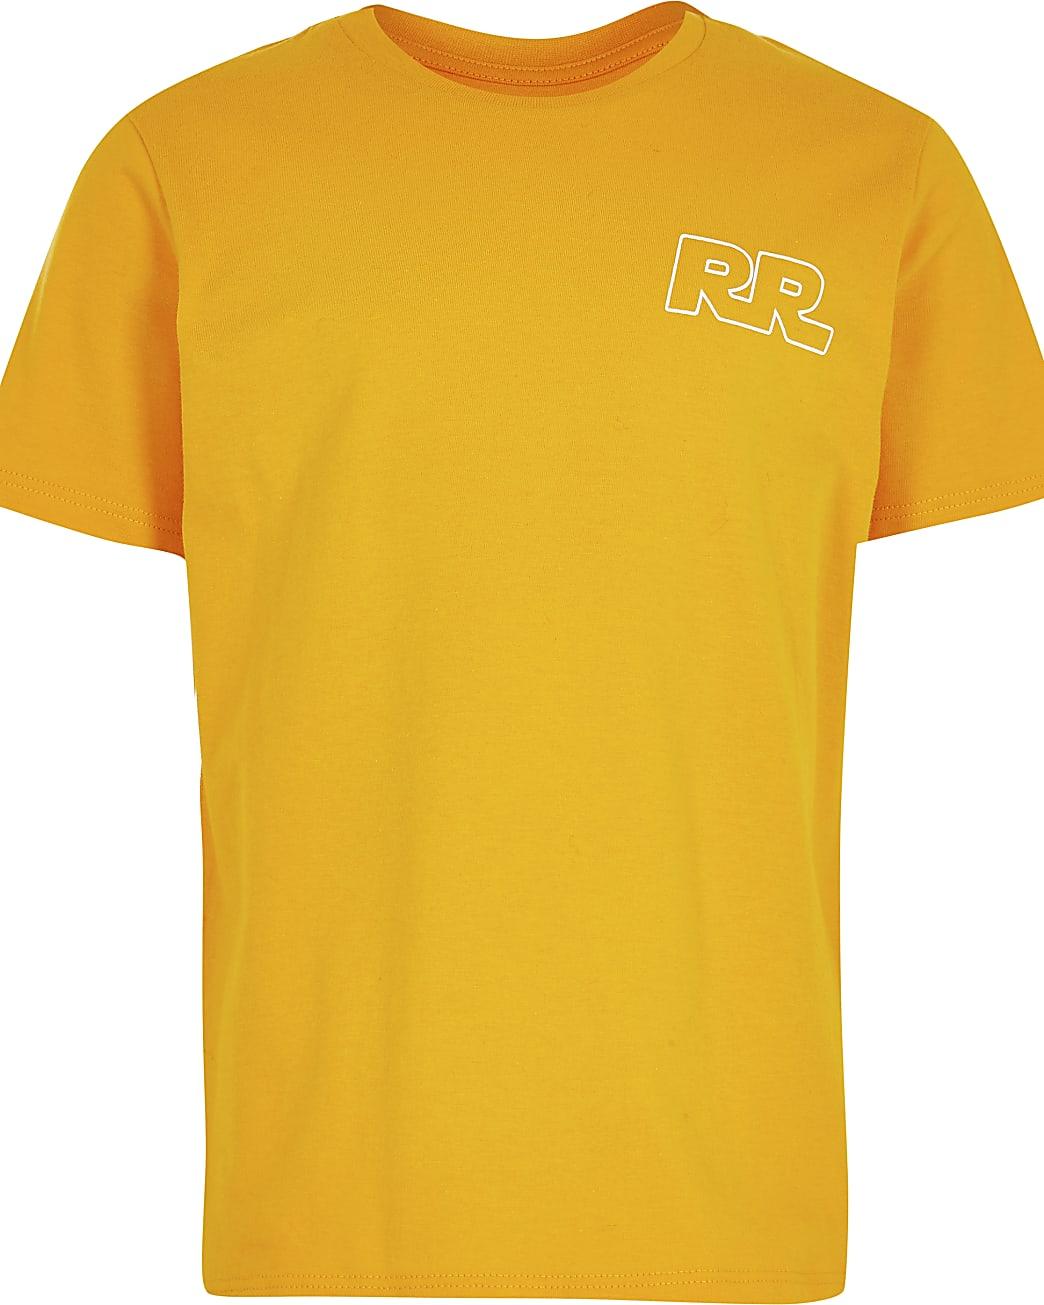 Boys orange 'RR' print t-shirt